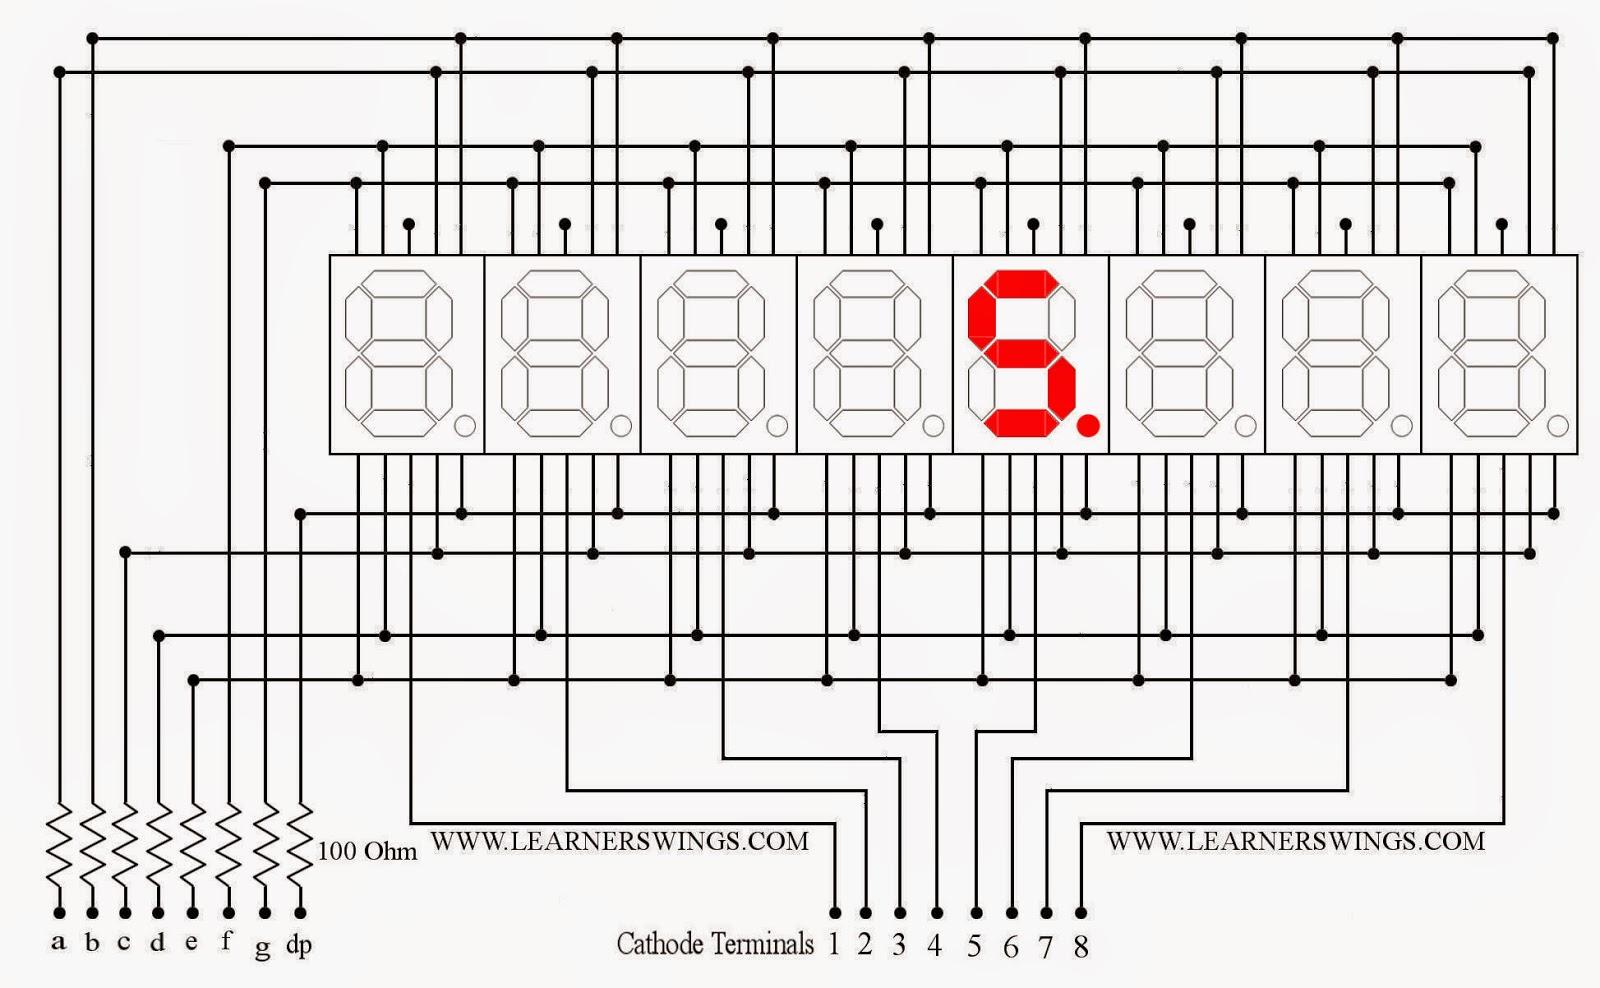 Program to Display 12345678 in 8 Seven Segment Displays